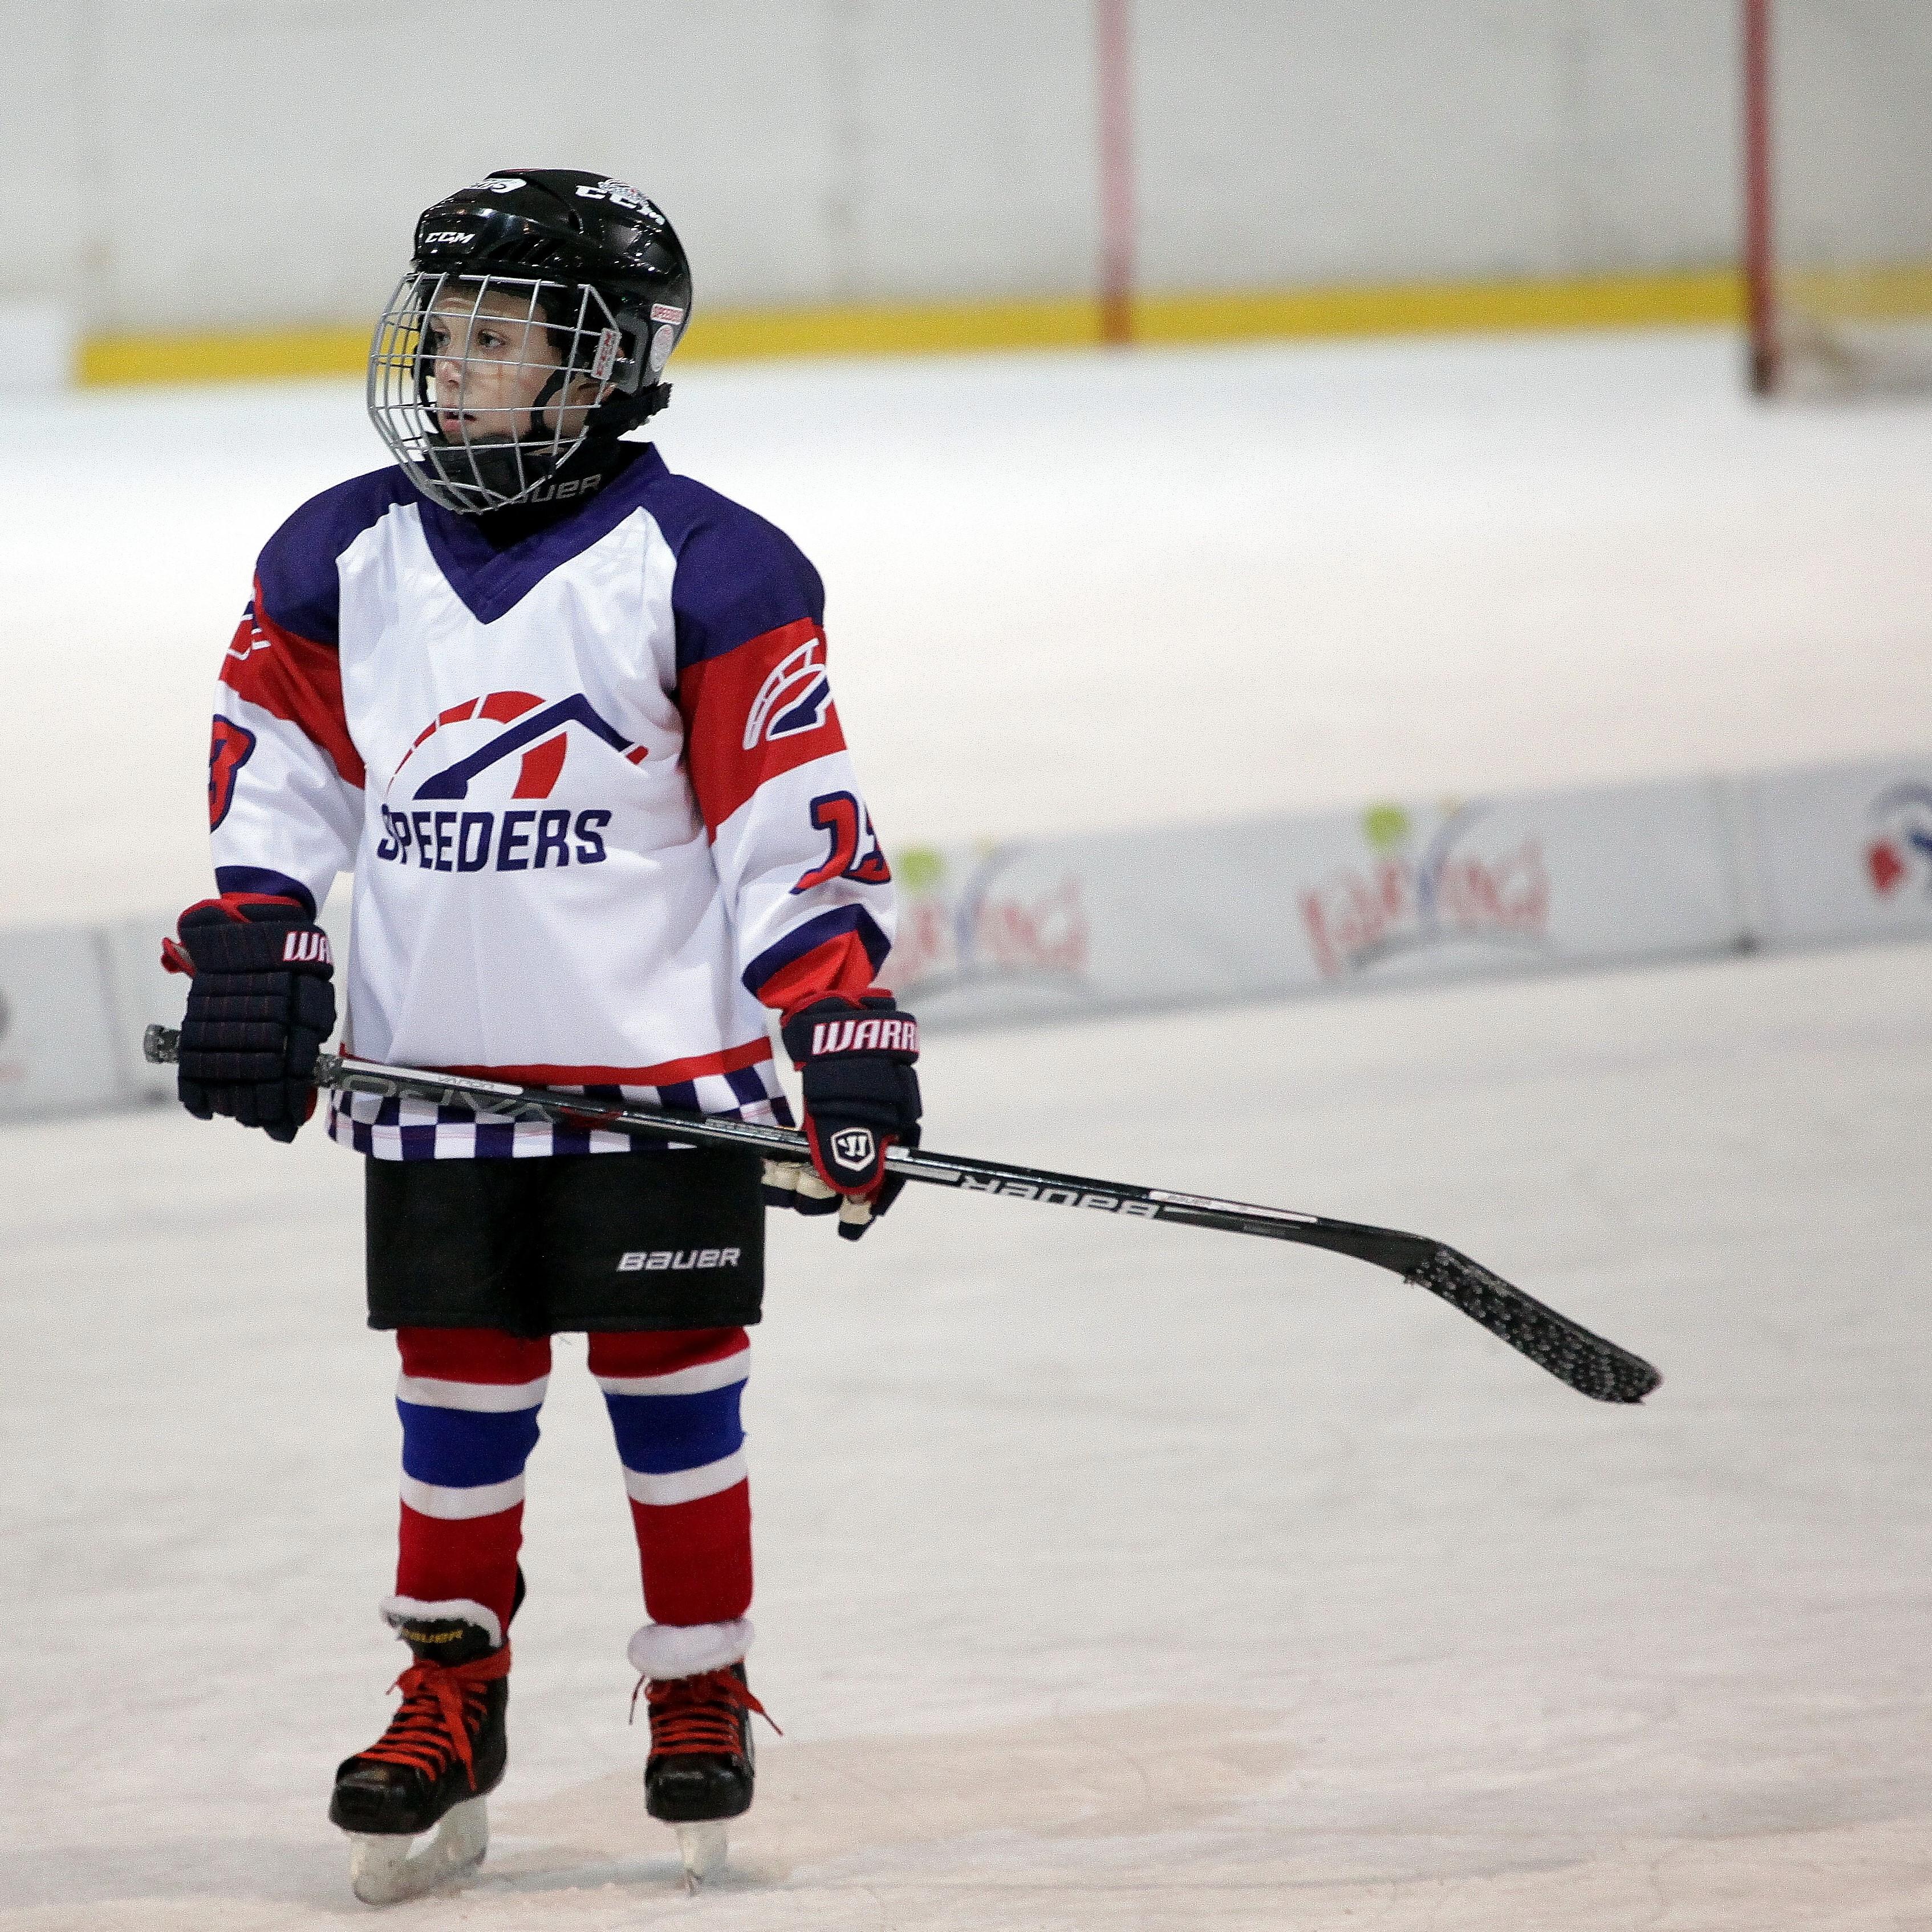 Speeders Hockey Bratislava turnaj karvina_ pato hrdlicka